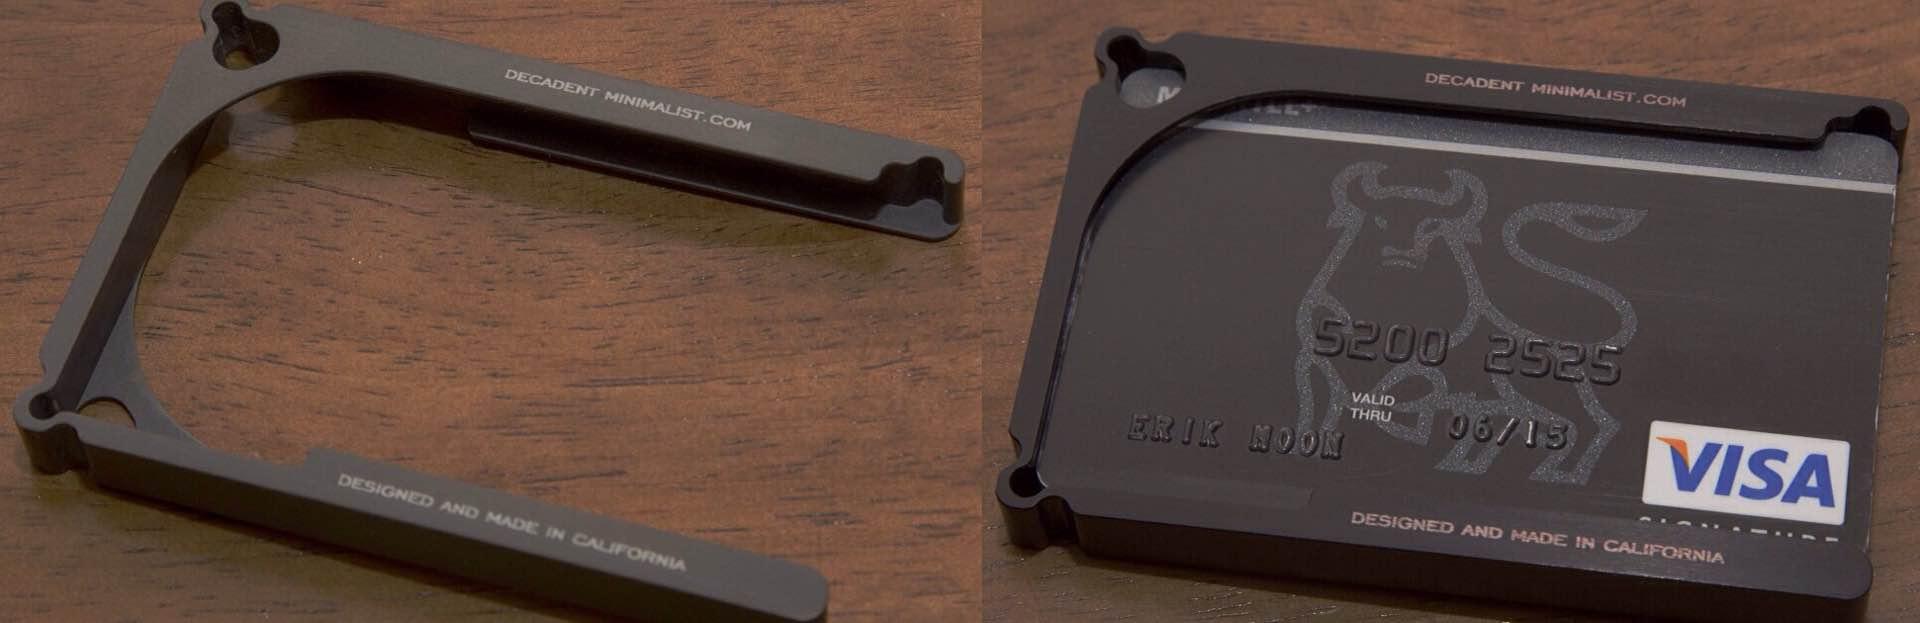 Decadent Minimalist One — Aluminum Wallet